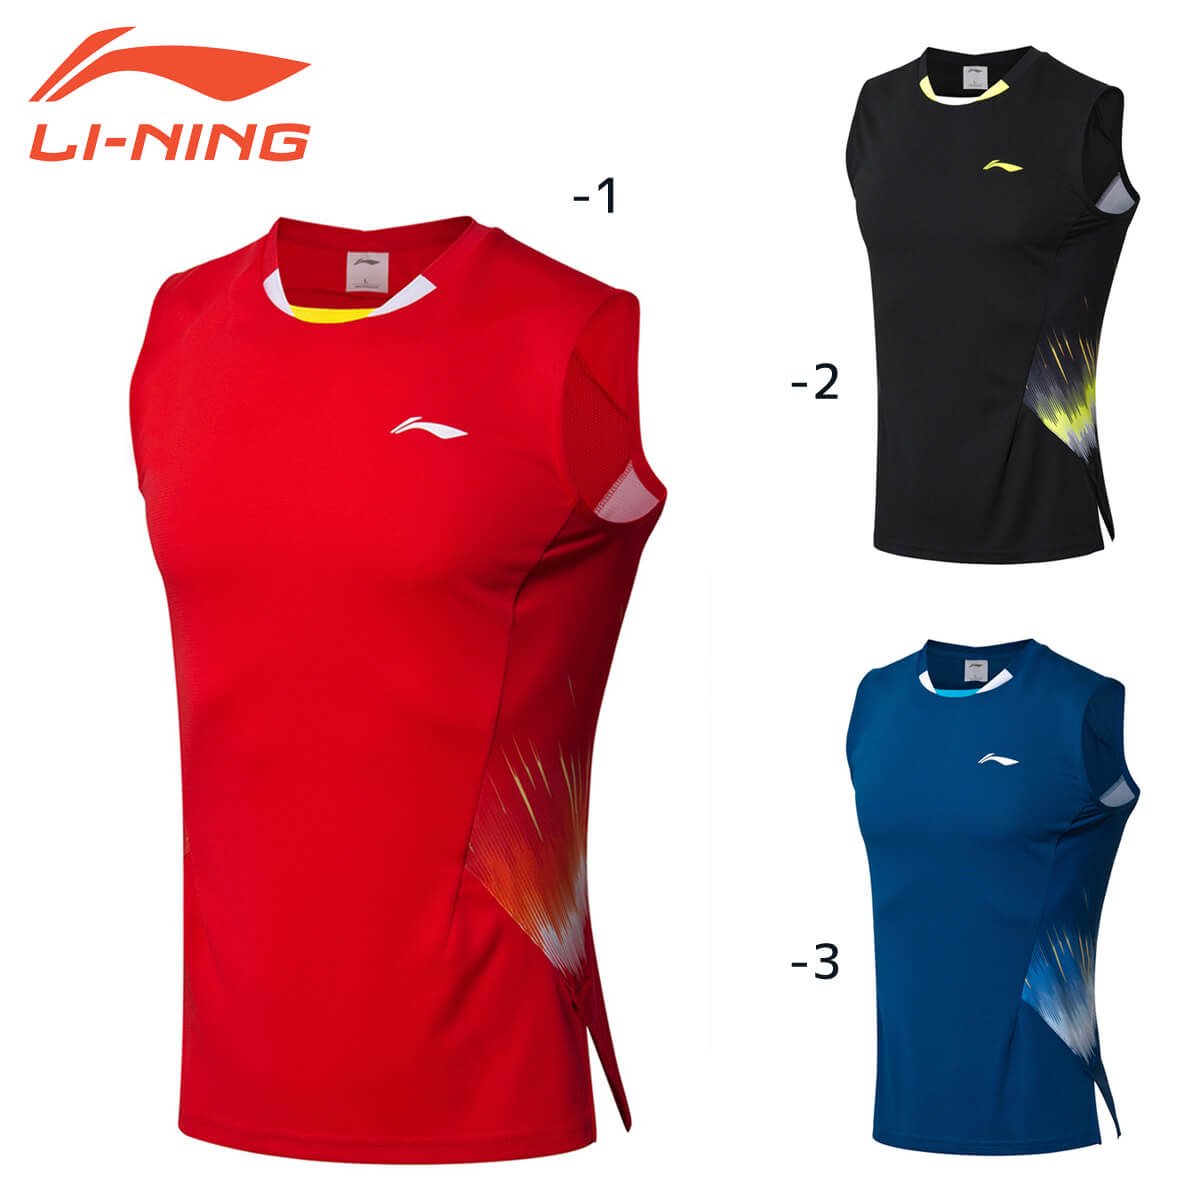 quality design 0405e 6e51d LI-NING AVSN293 game shirt China national team (uni-/ men) badminton wear  Lee Nin